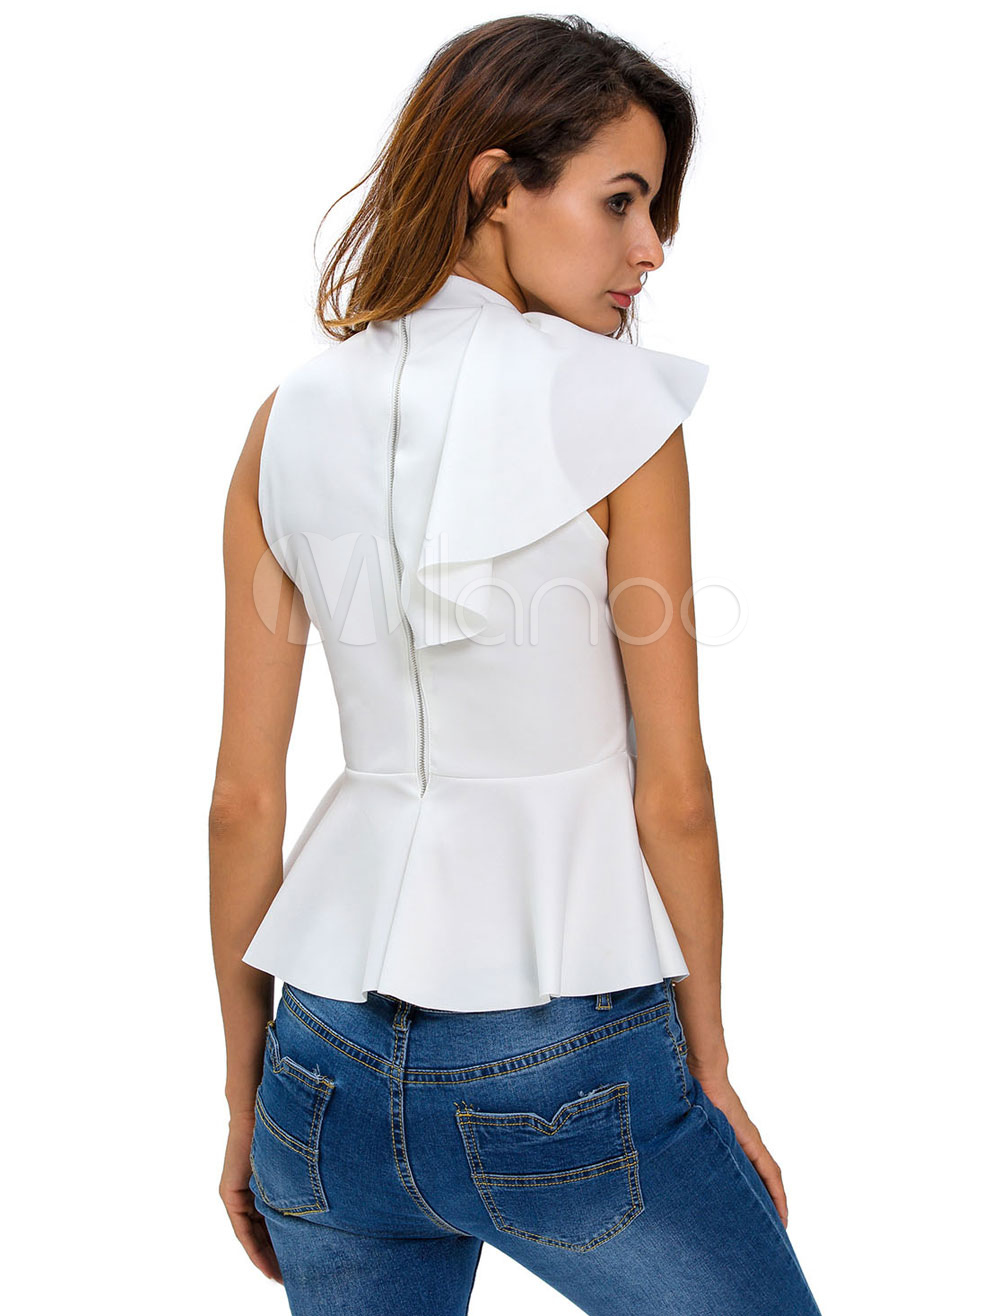 Plus Size Dress Shirts For Women